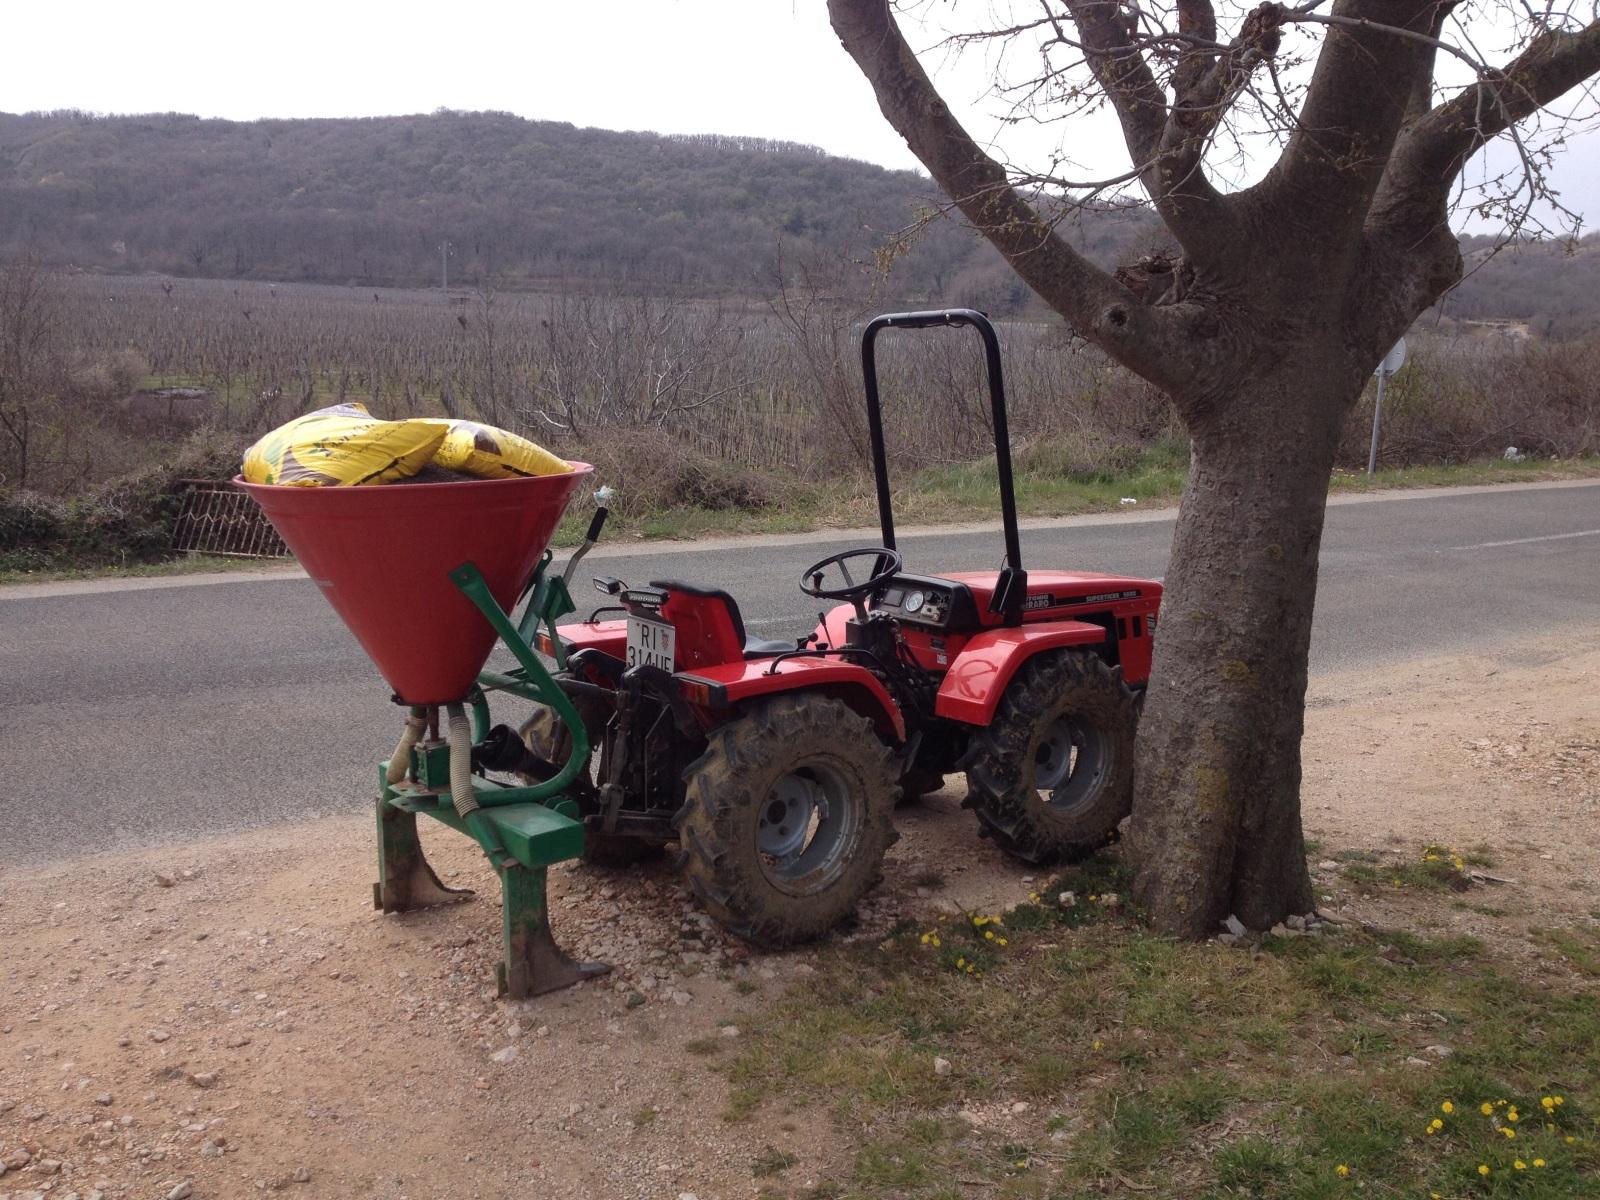 Radovi & poslovi u vinogradu - Page 3 Mtnf6c